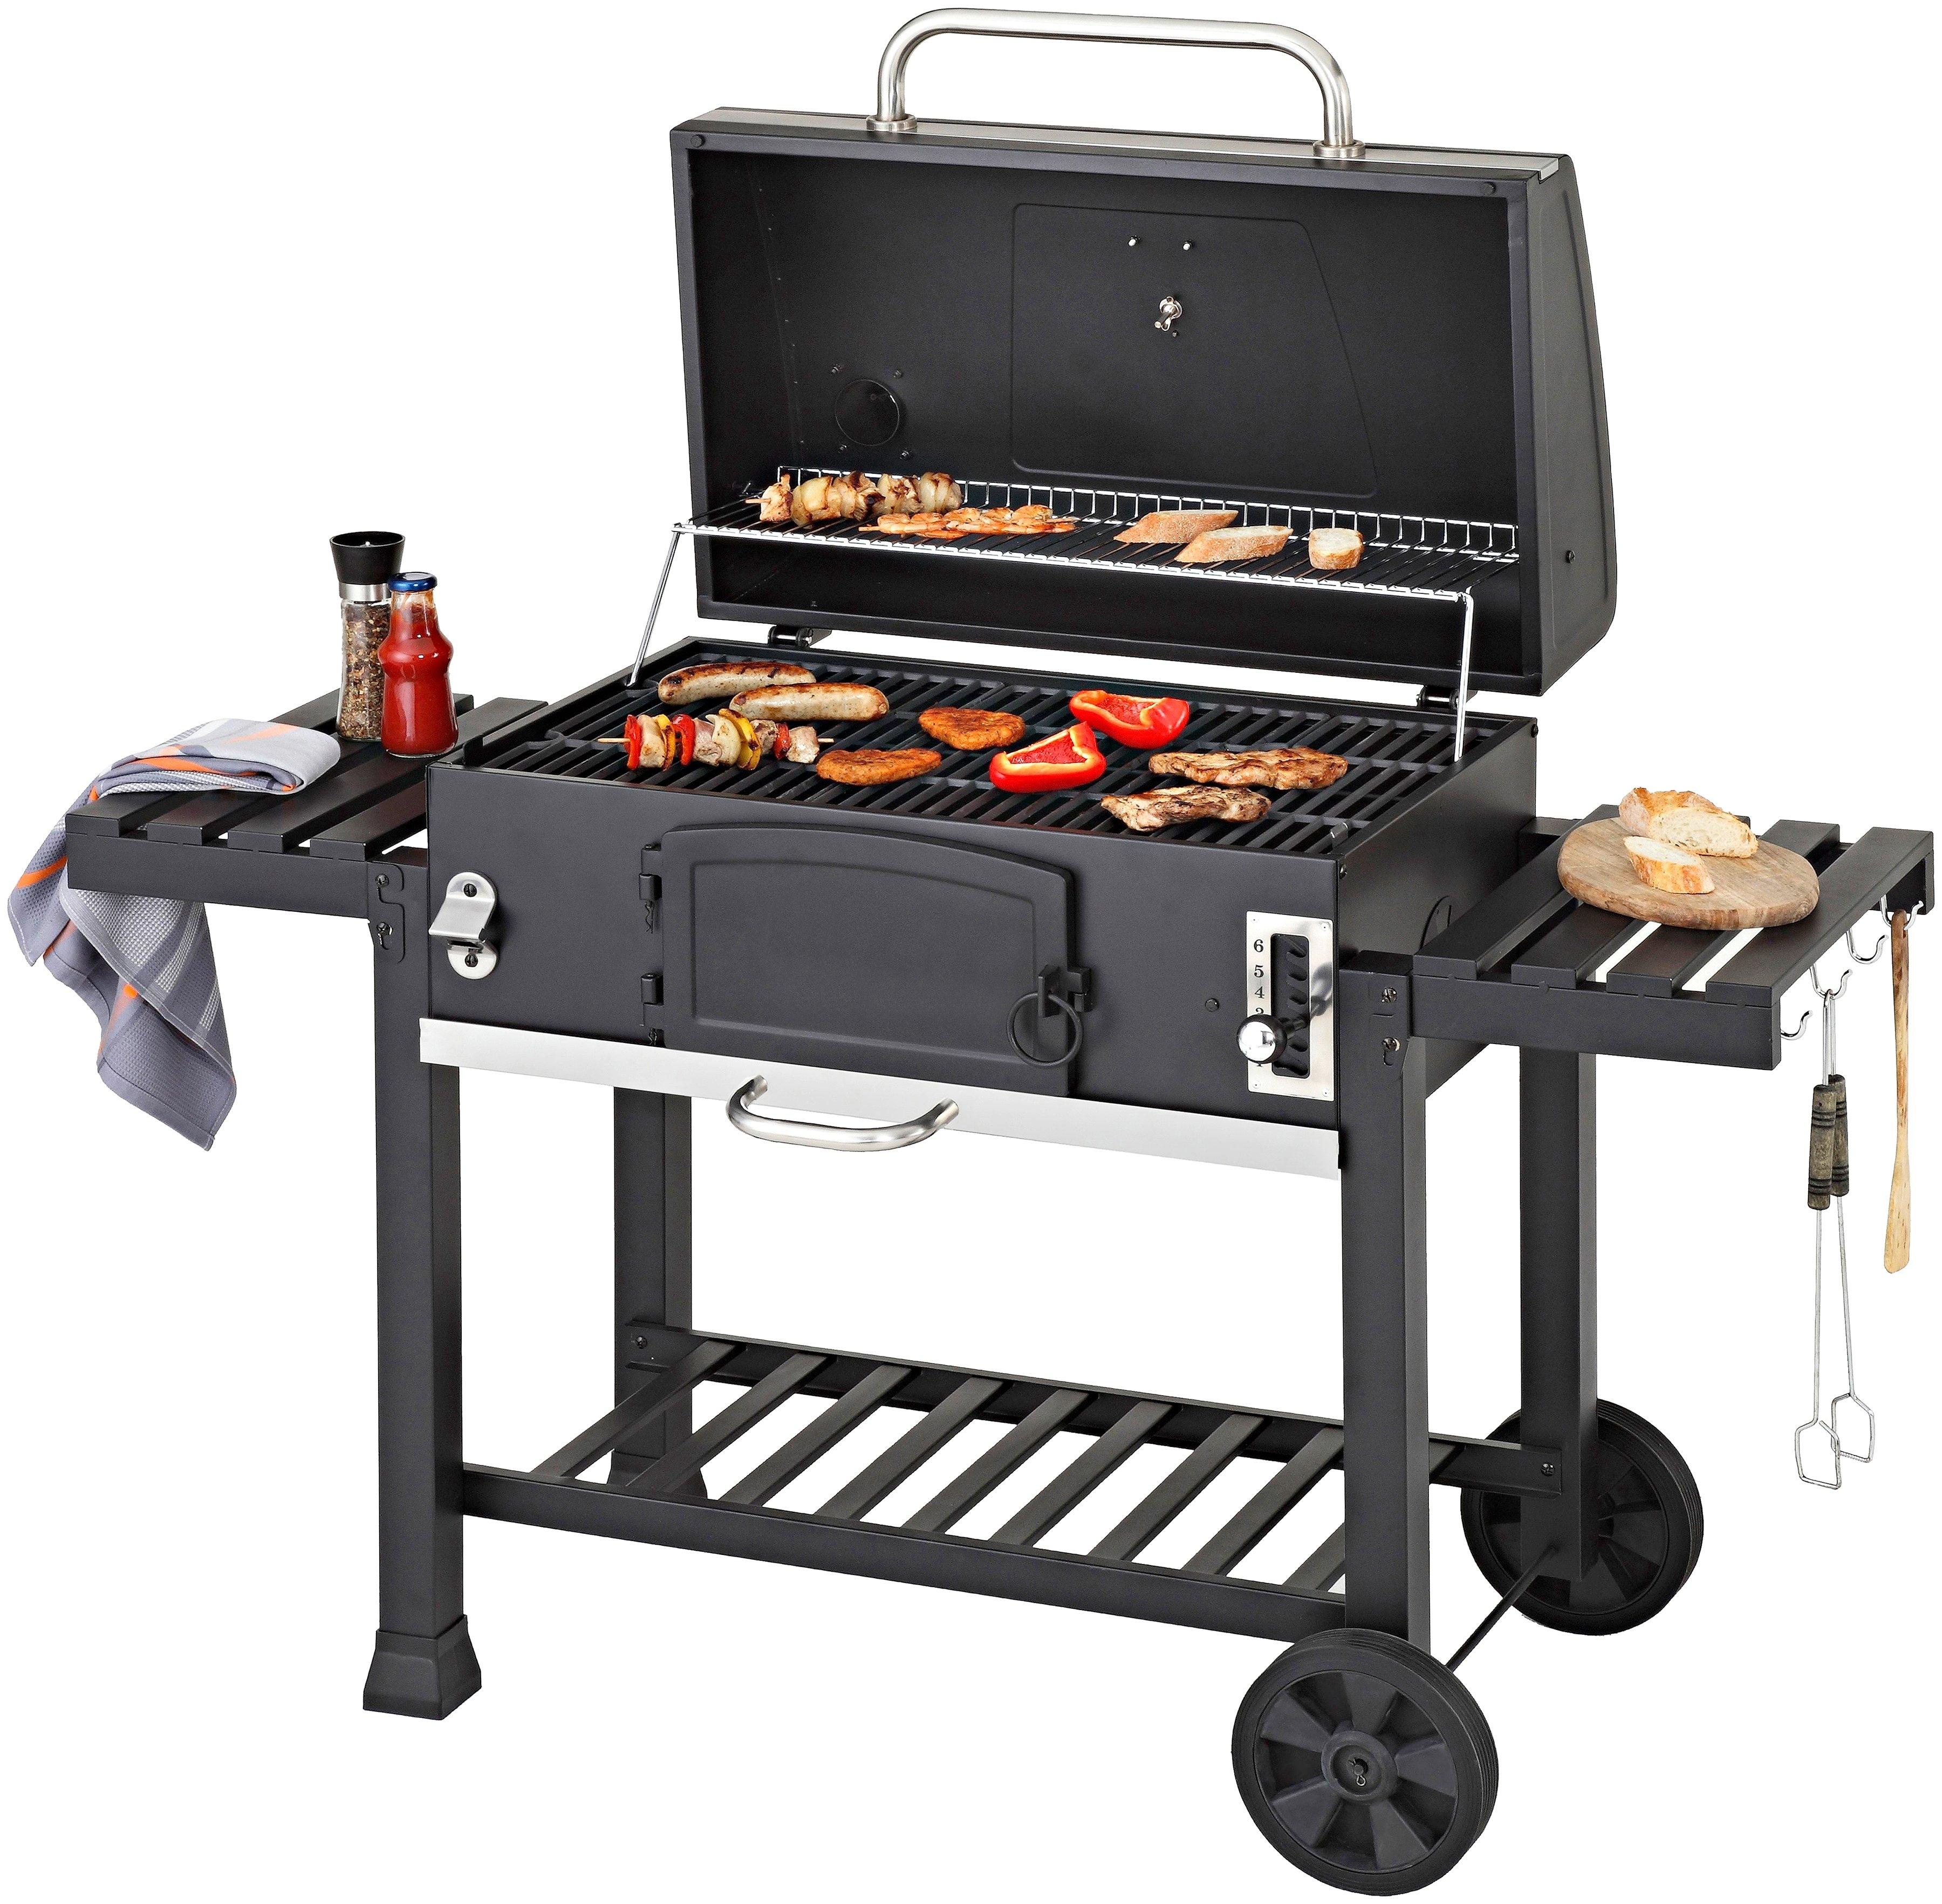 Konifera Houtskoolbarbecue »Belcarra XXL«, BxDxH: 142x64x113 cm, 2-dlg. grillrooster nu online bestellen